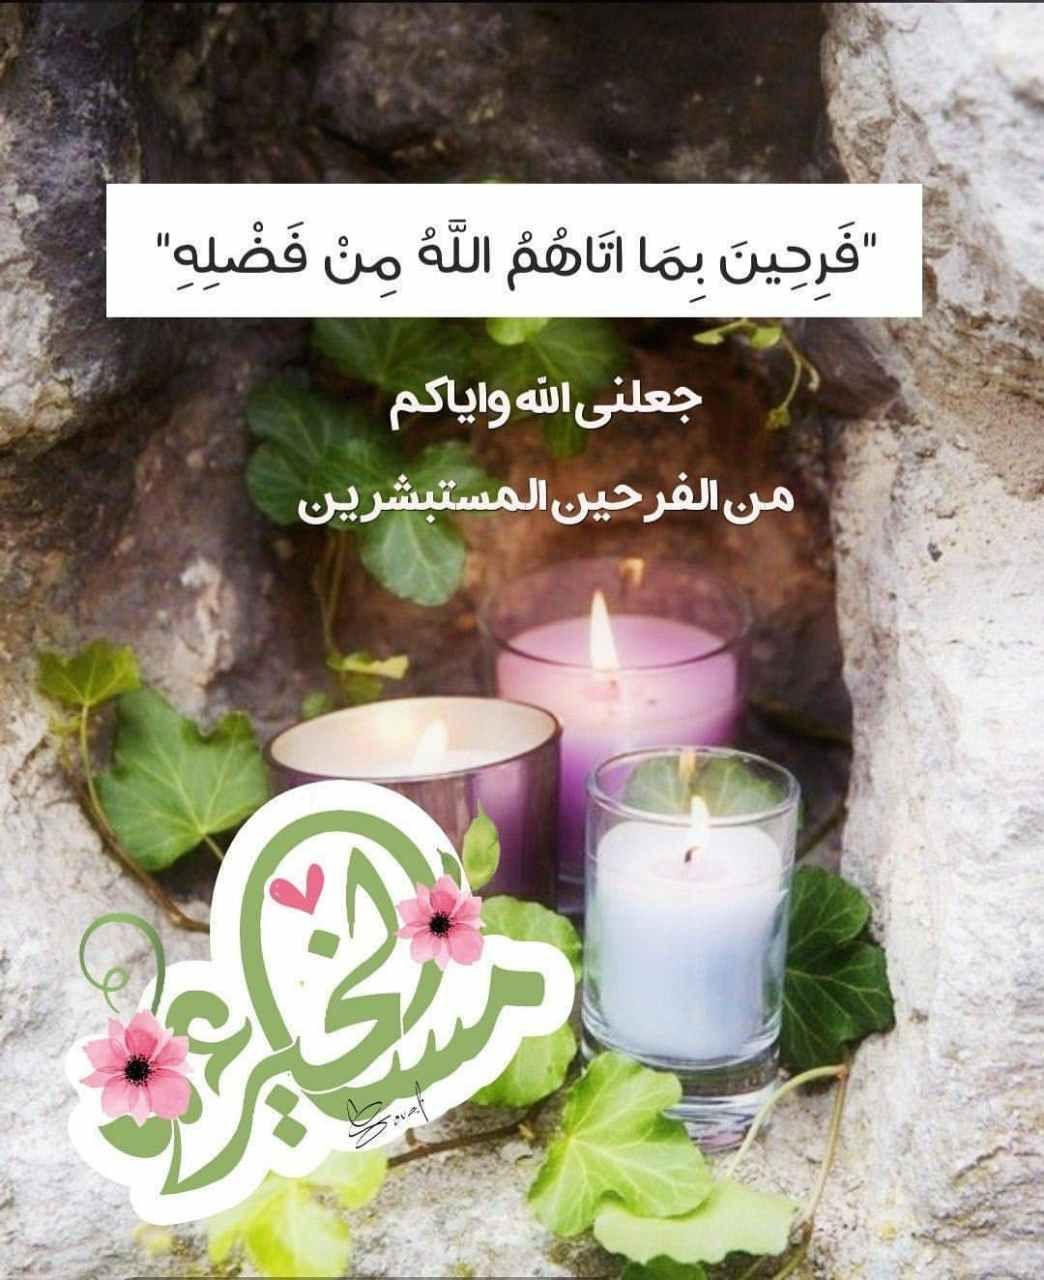 Pin By Hala Khatib On مساء الخير In 2021 Tea Lights Pillar Candles Tea Light Candle